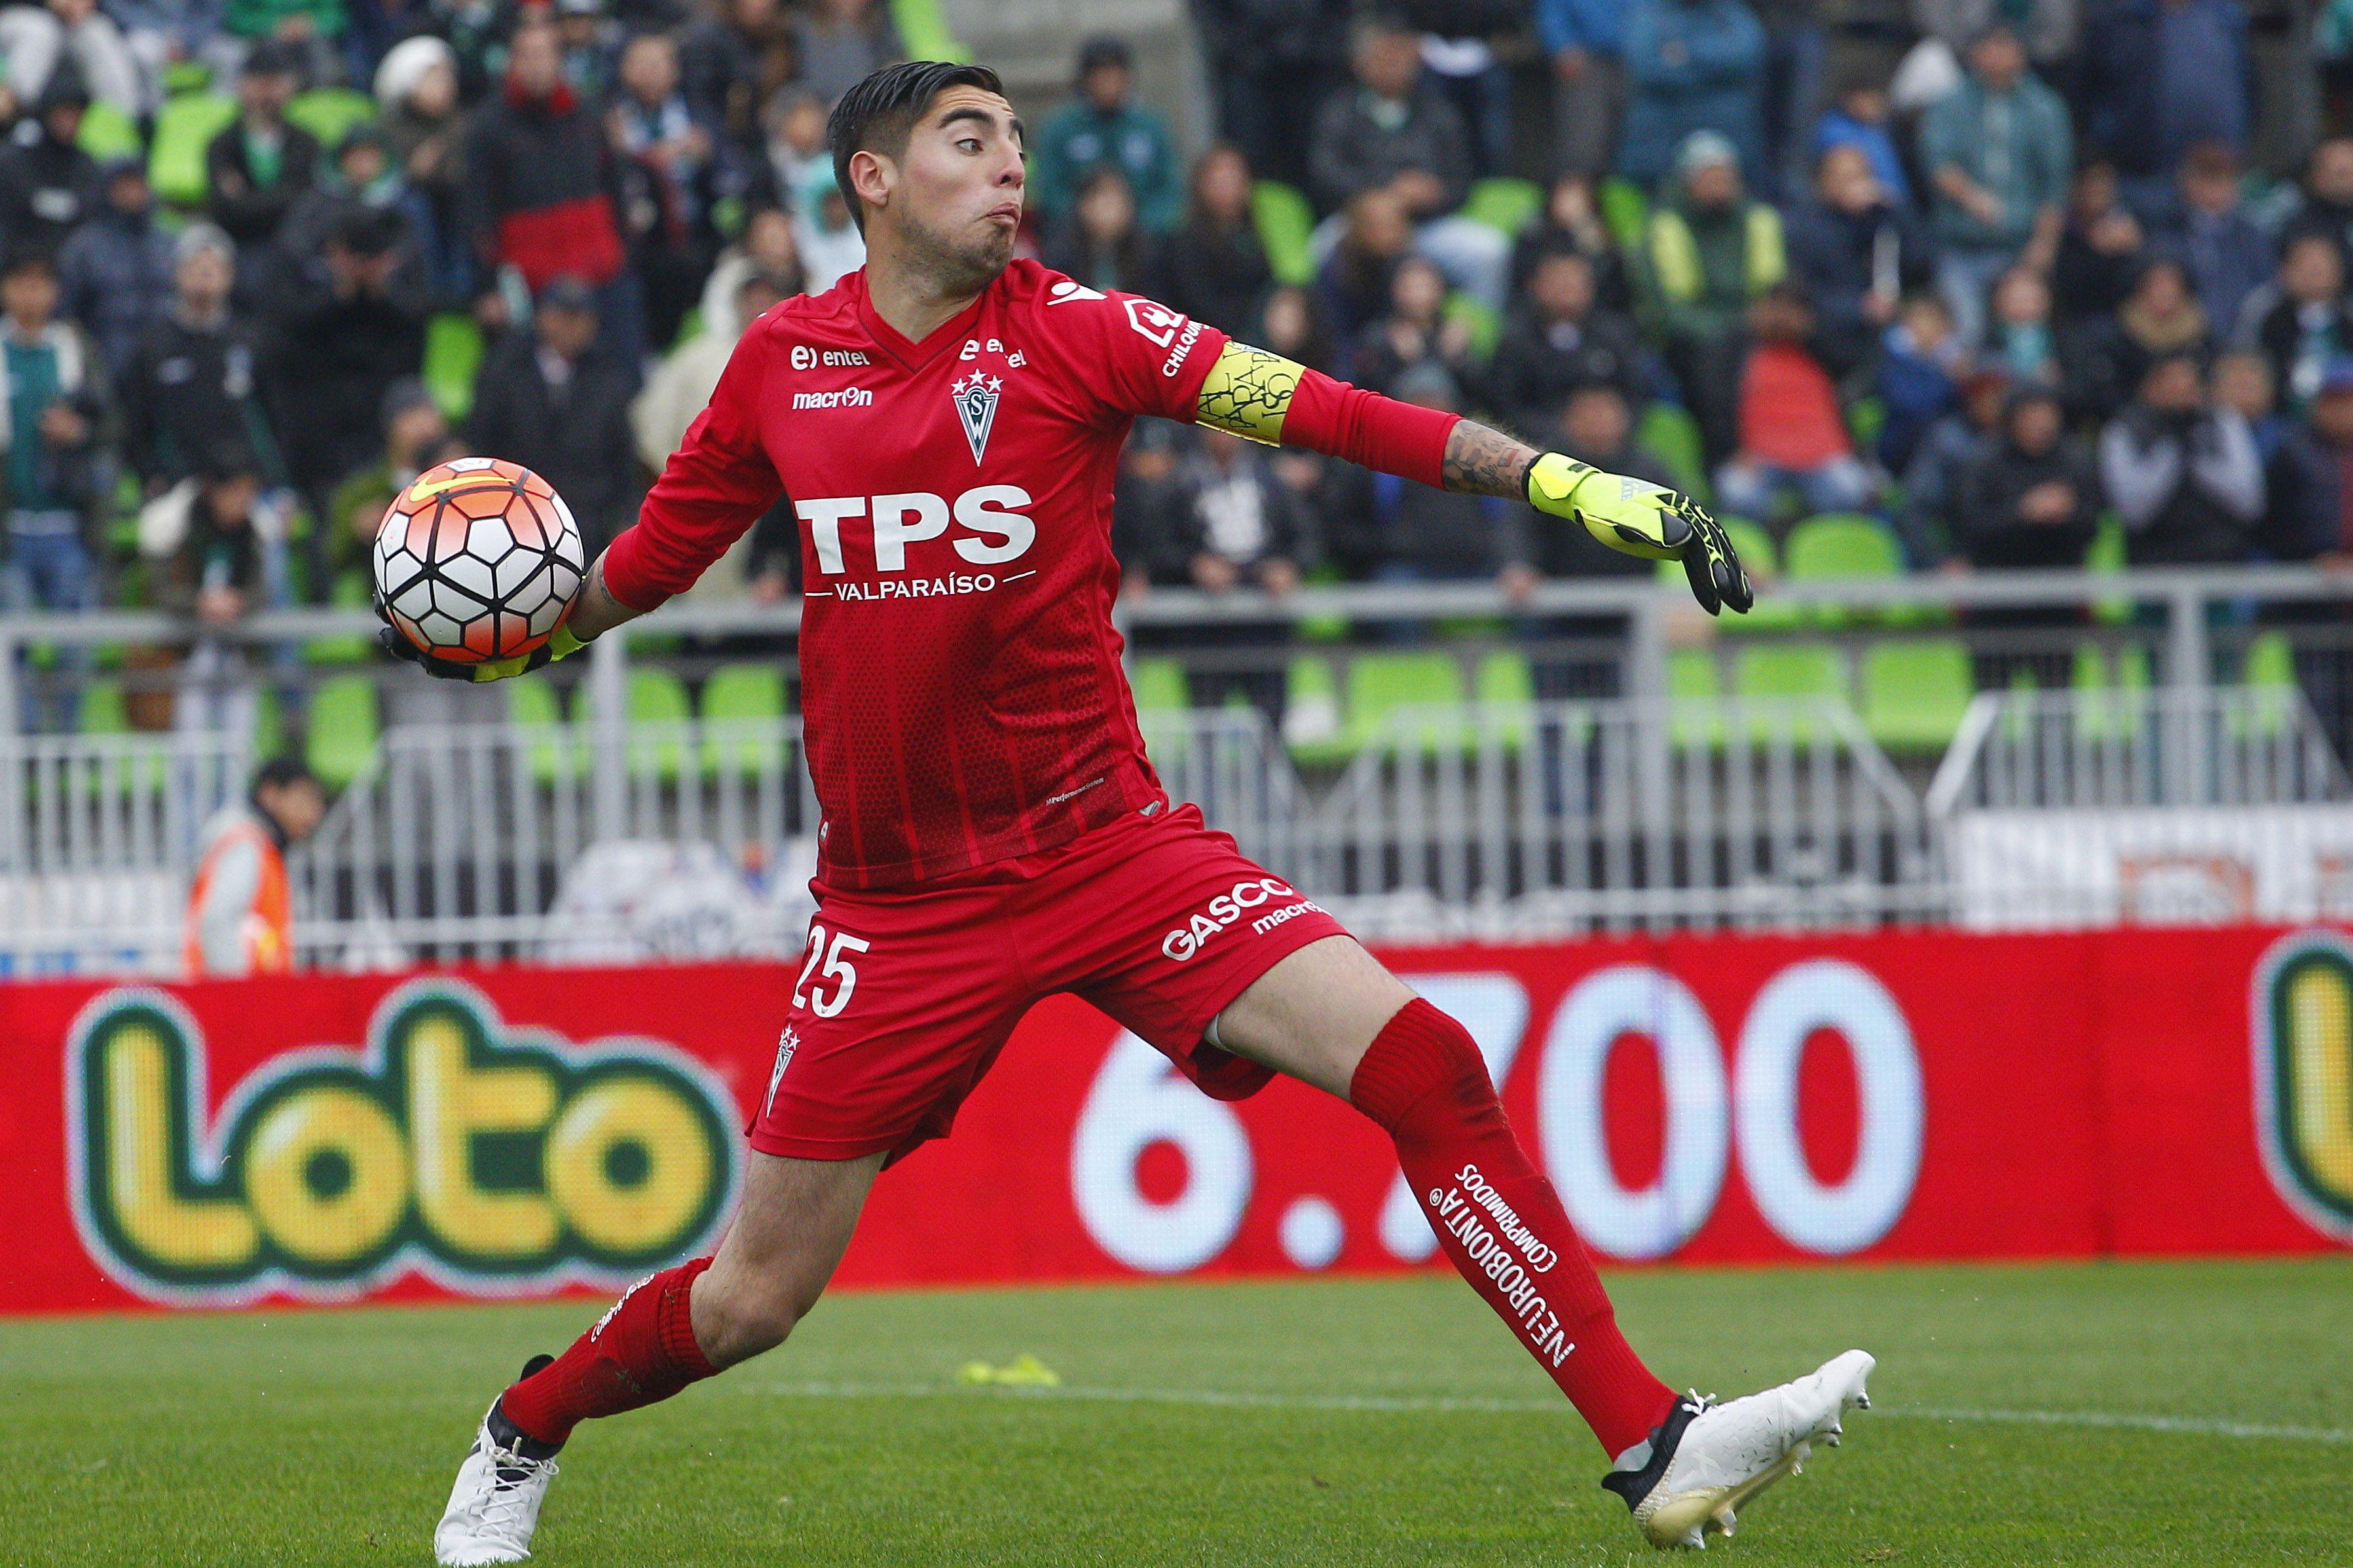 Gabriel Castellón, Santiago Wanderers / Photosport